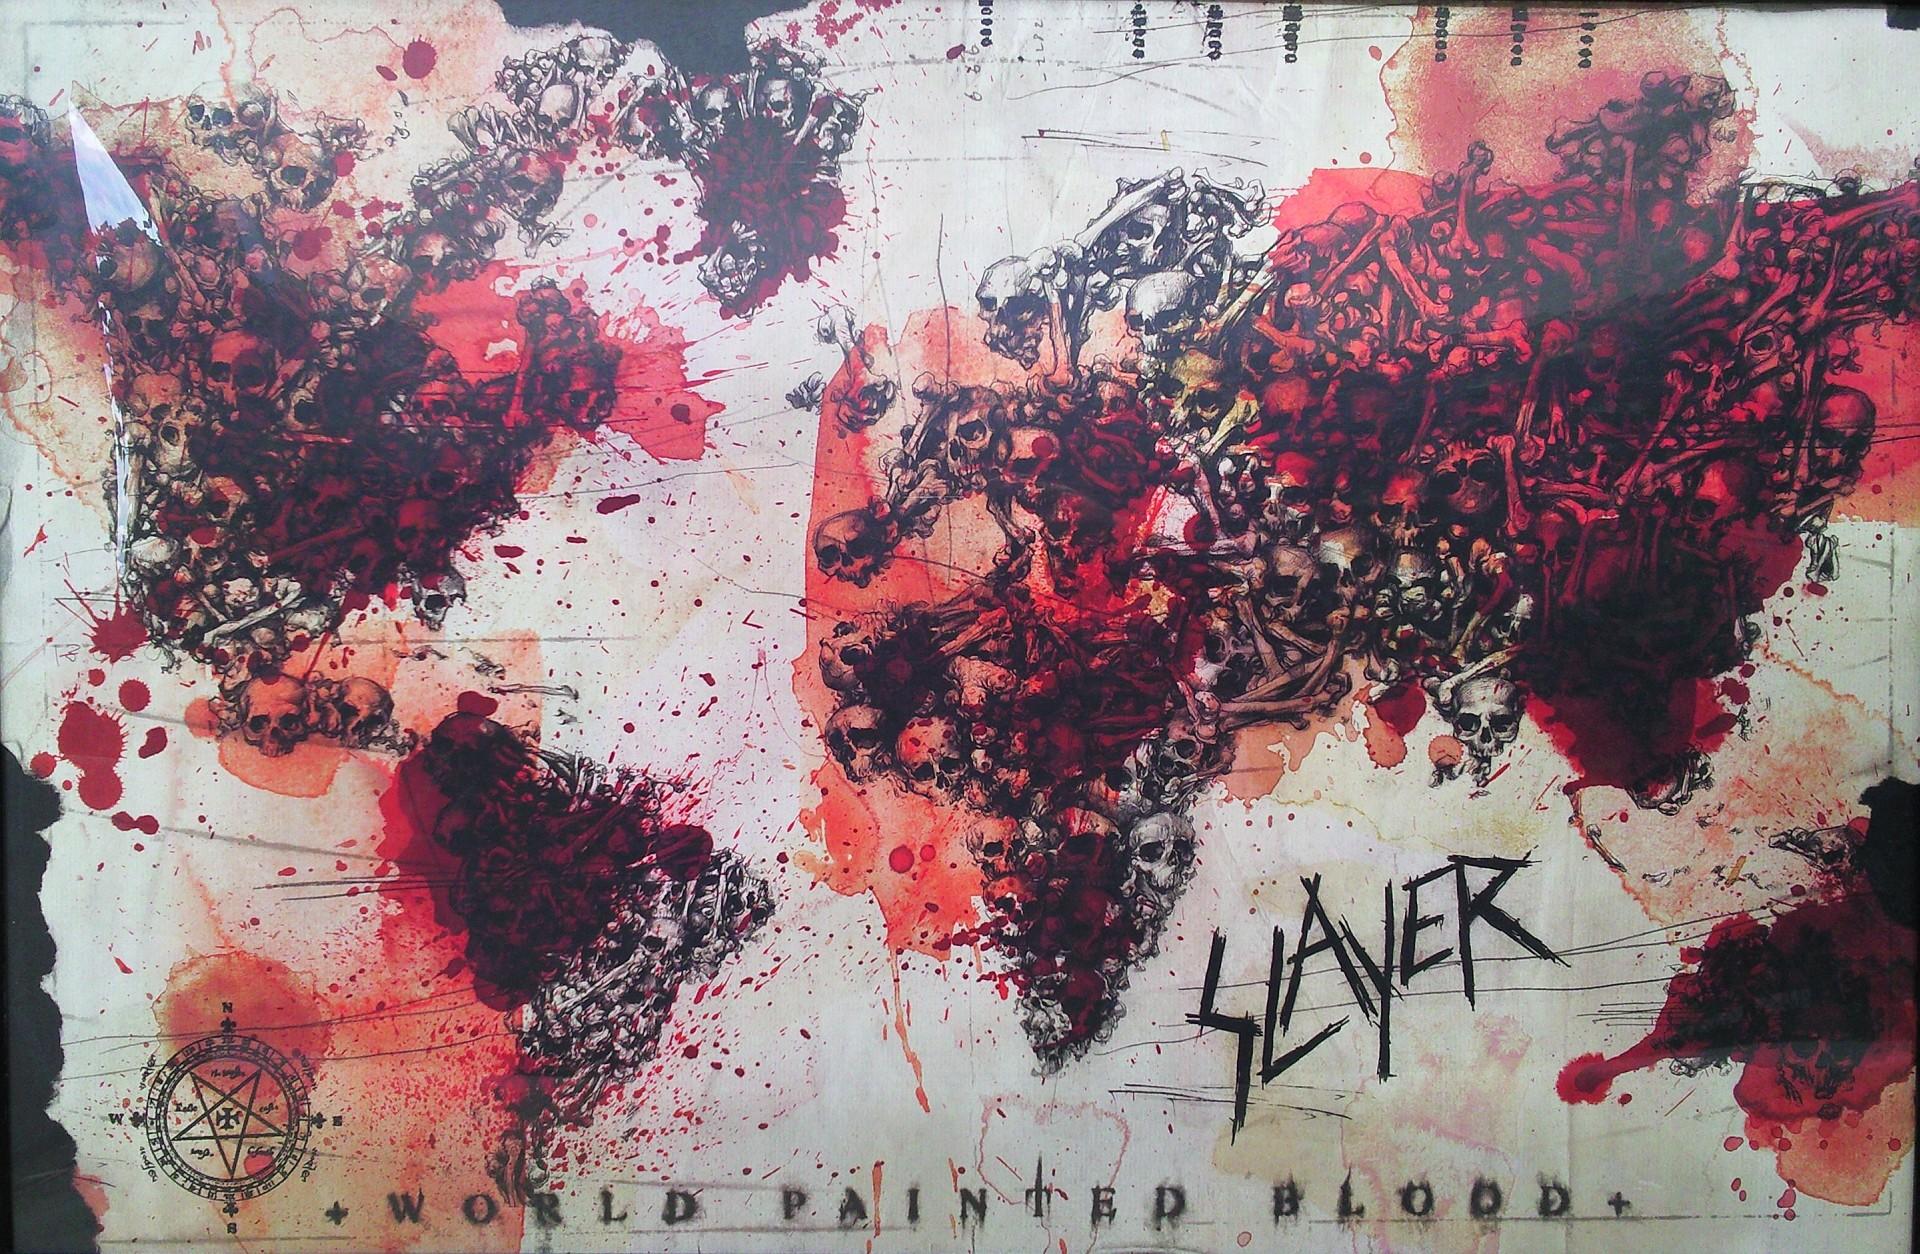 Music Slayer Wallpaper 1920x1254 Music Slayer 1920x1254